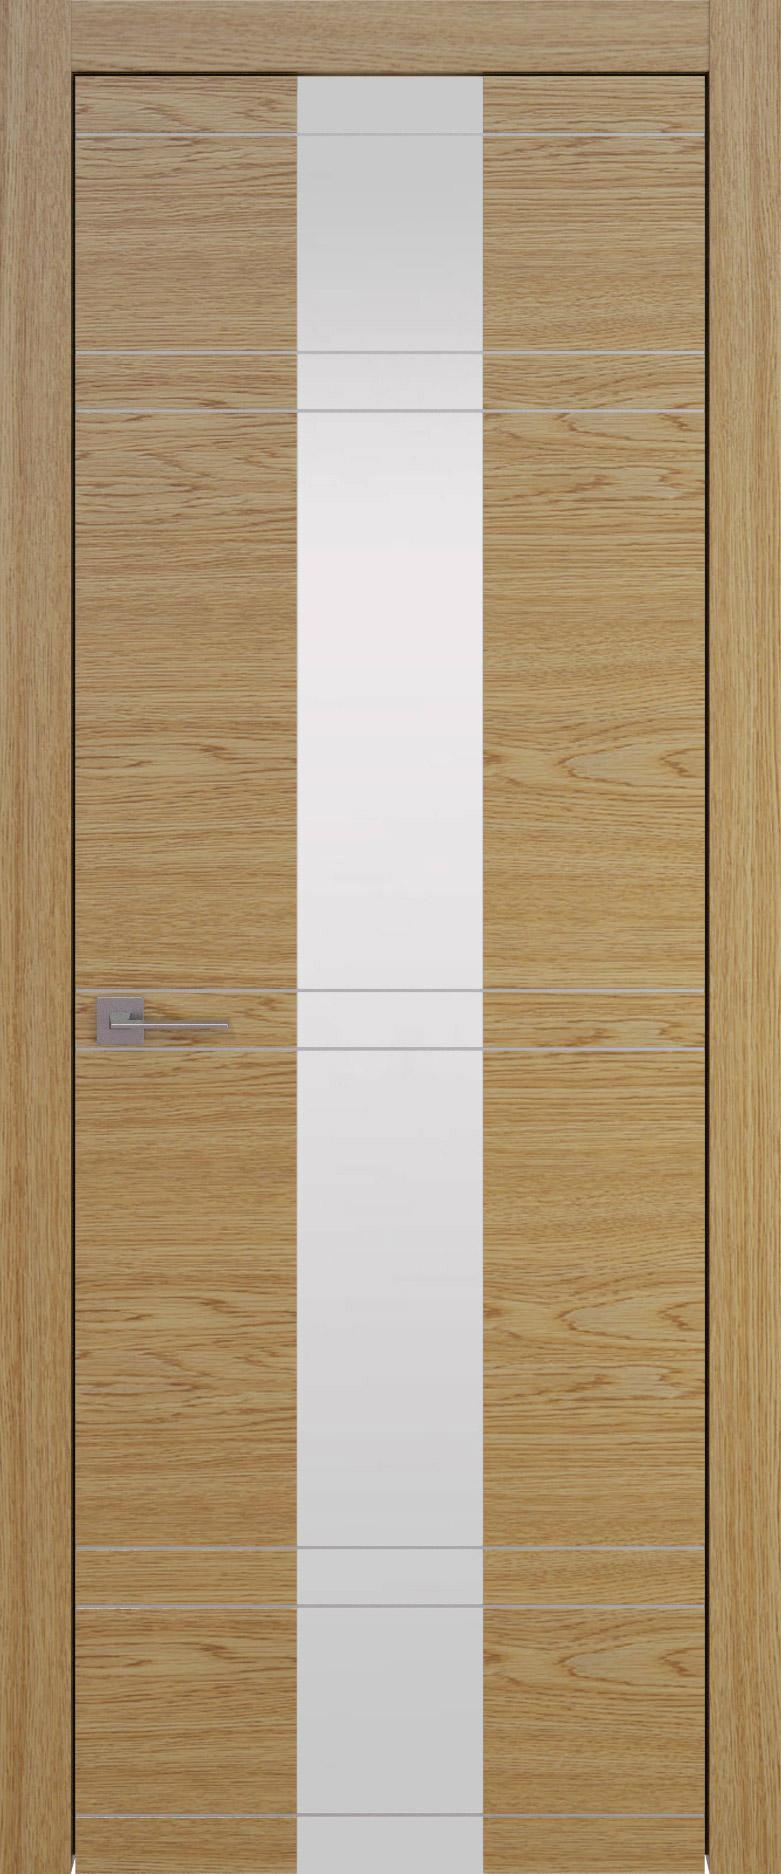 Tivoli Ж-4 цвет - Дуб карамель Со стеклом (ДО)